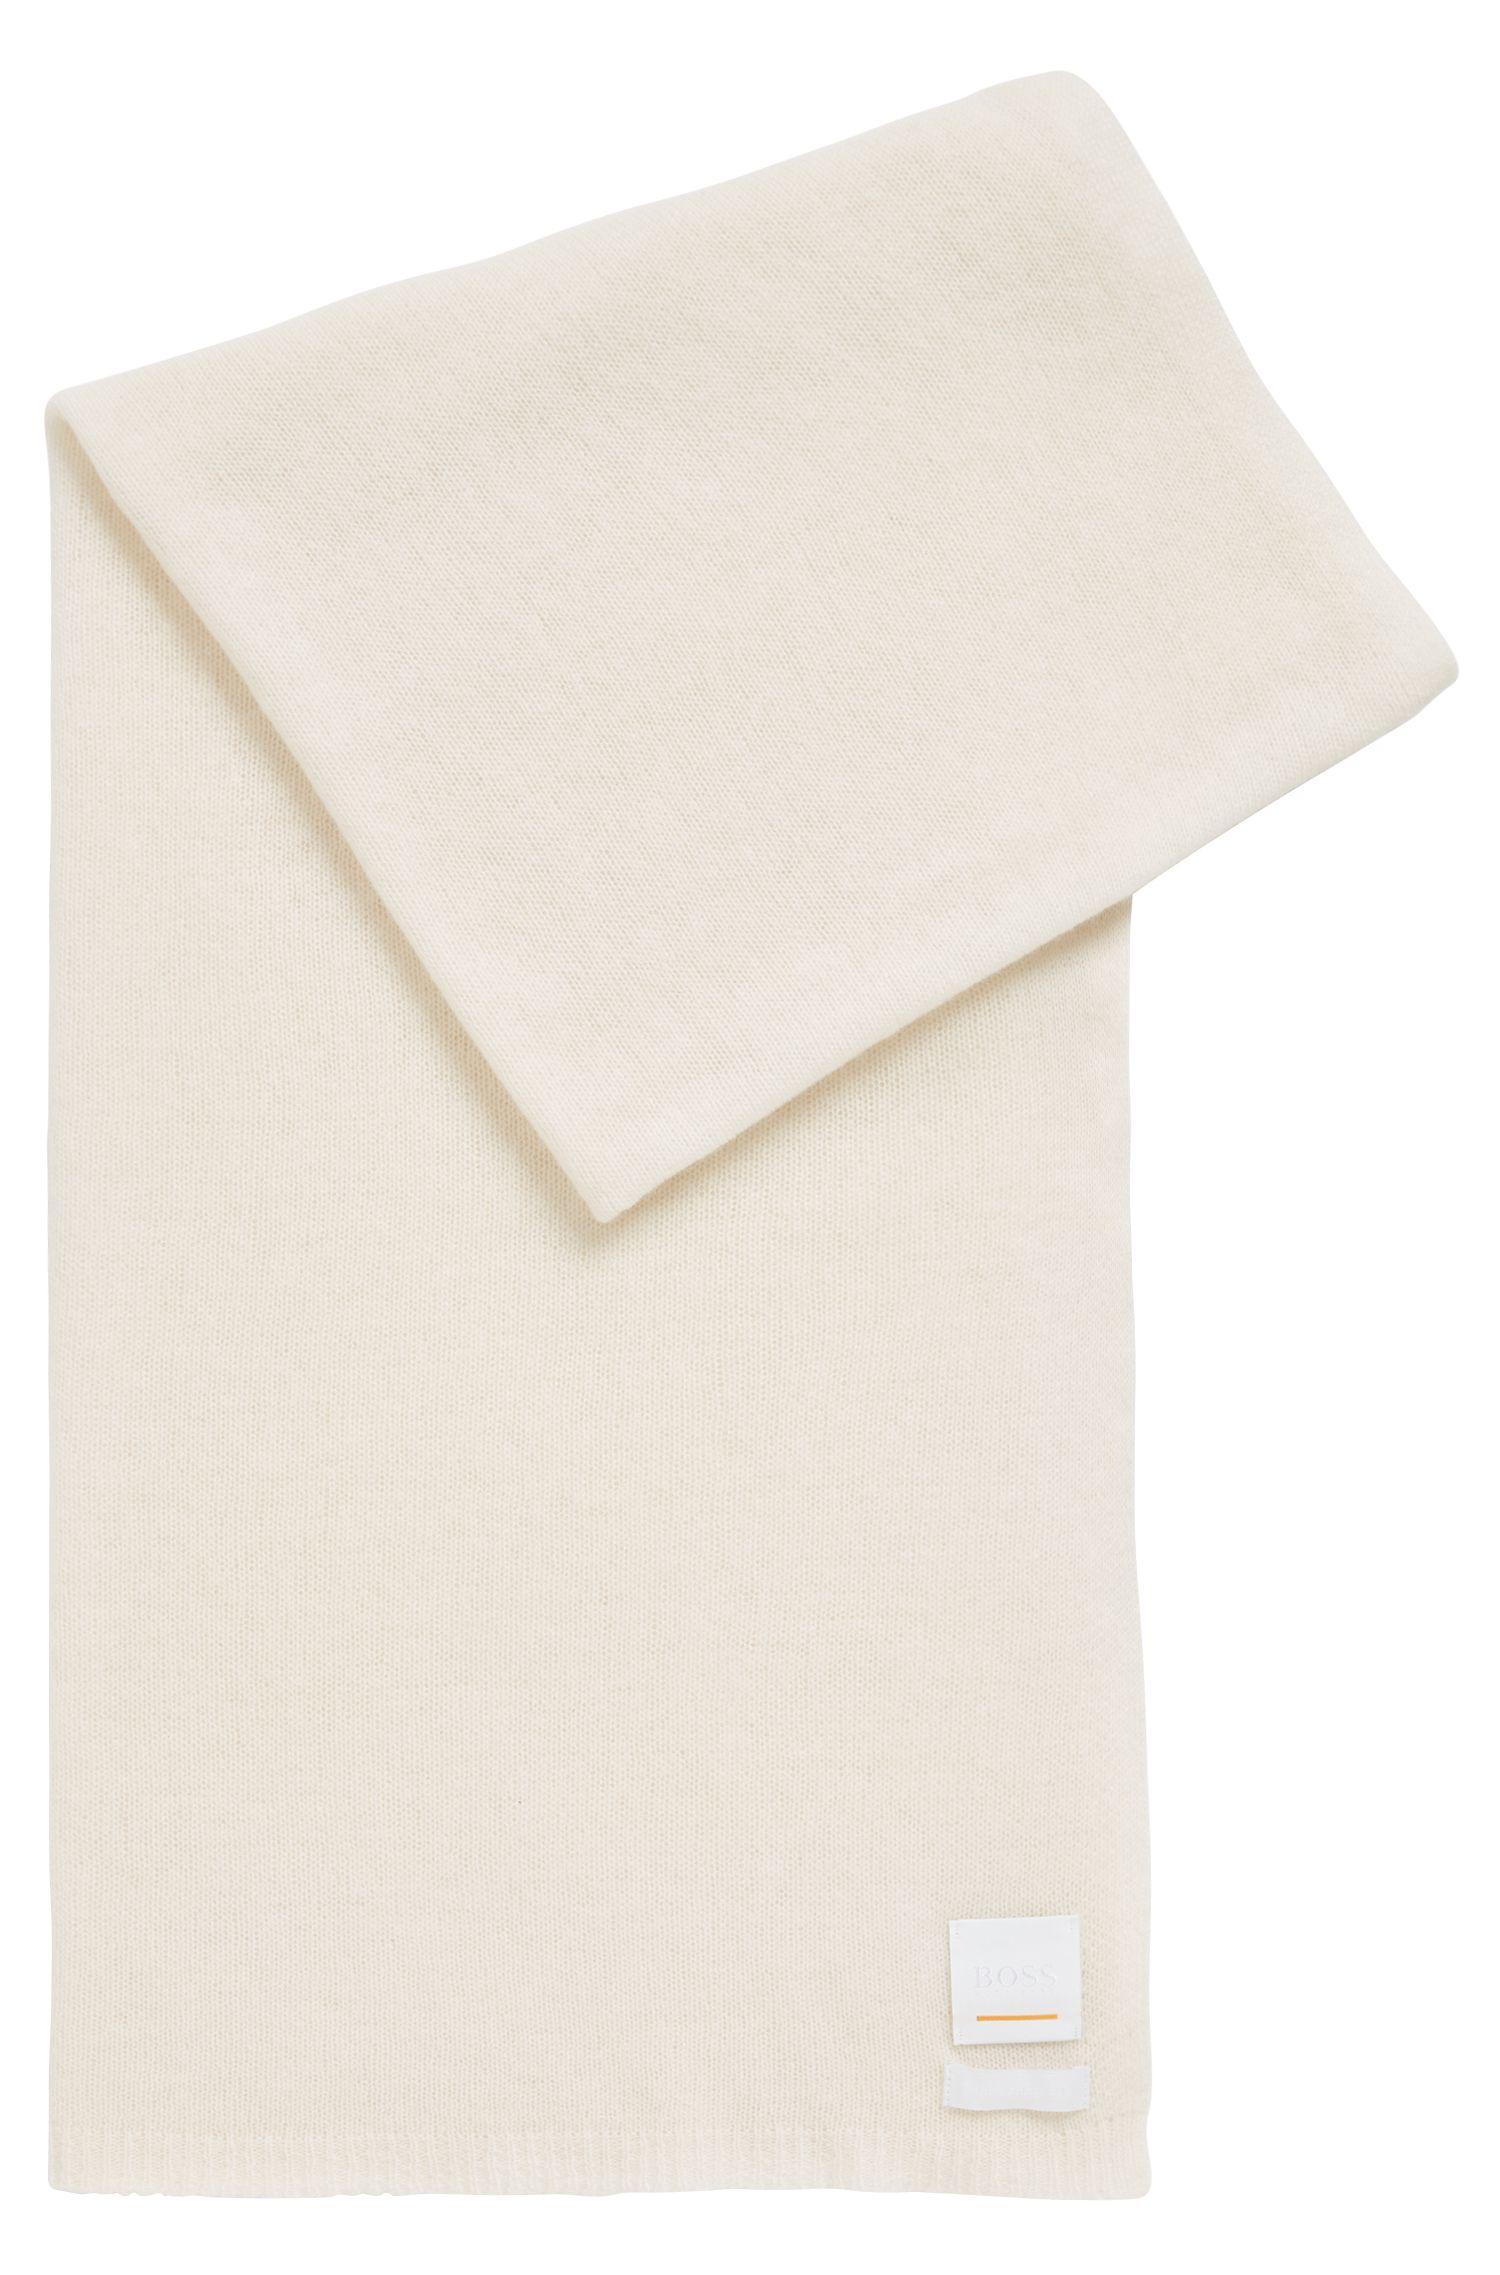 Leichter Strickschal aus Woll-Mix mit Kaschmir, Weiß